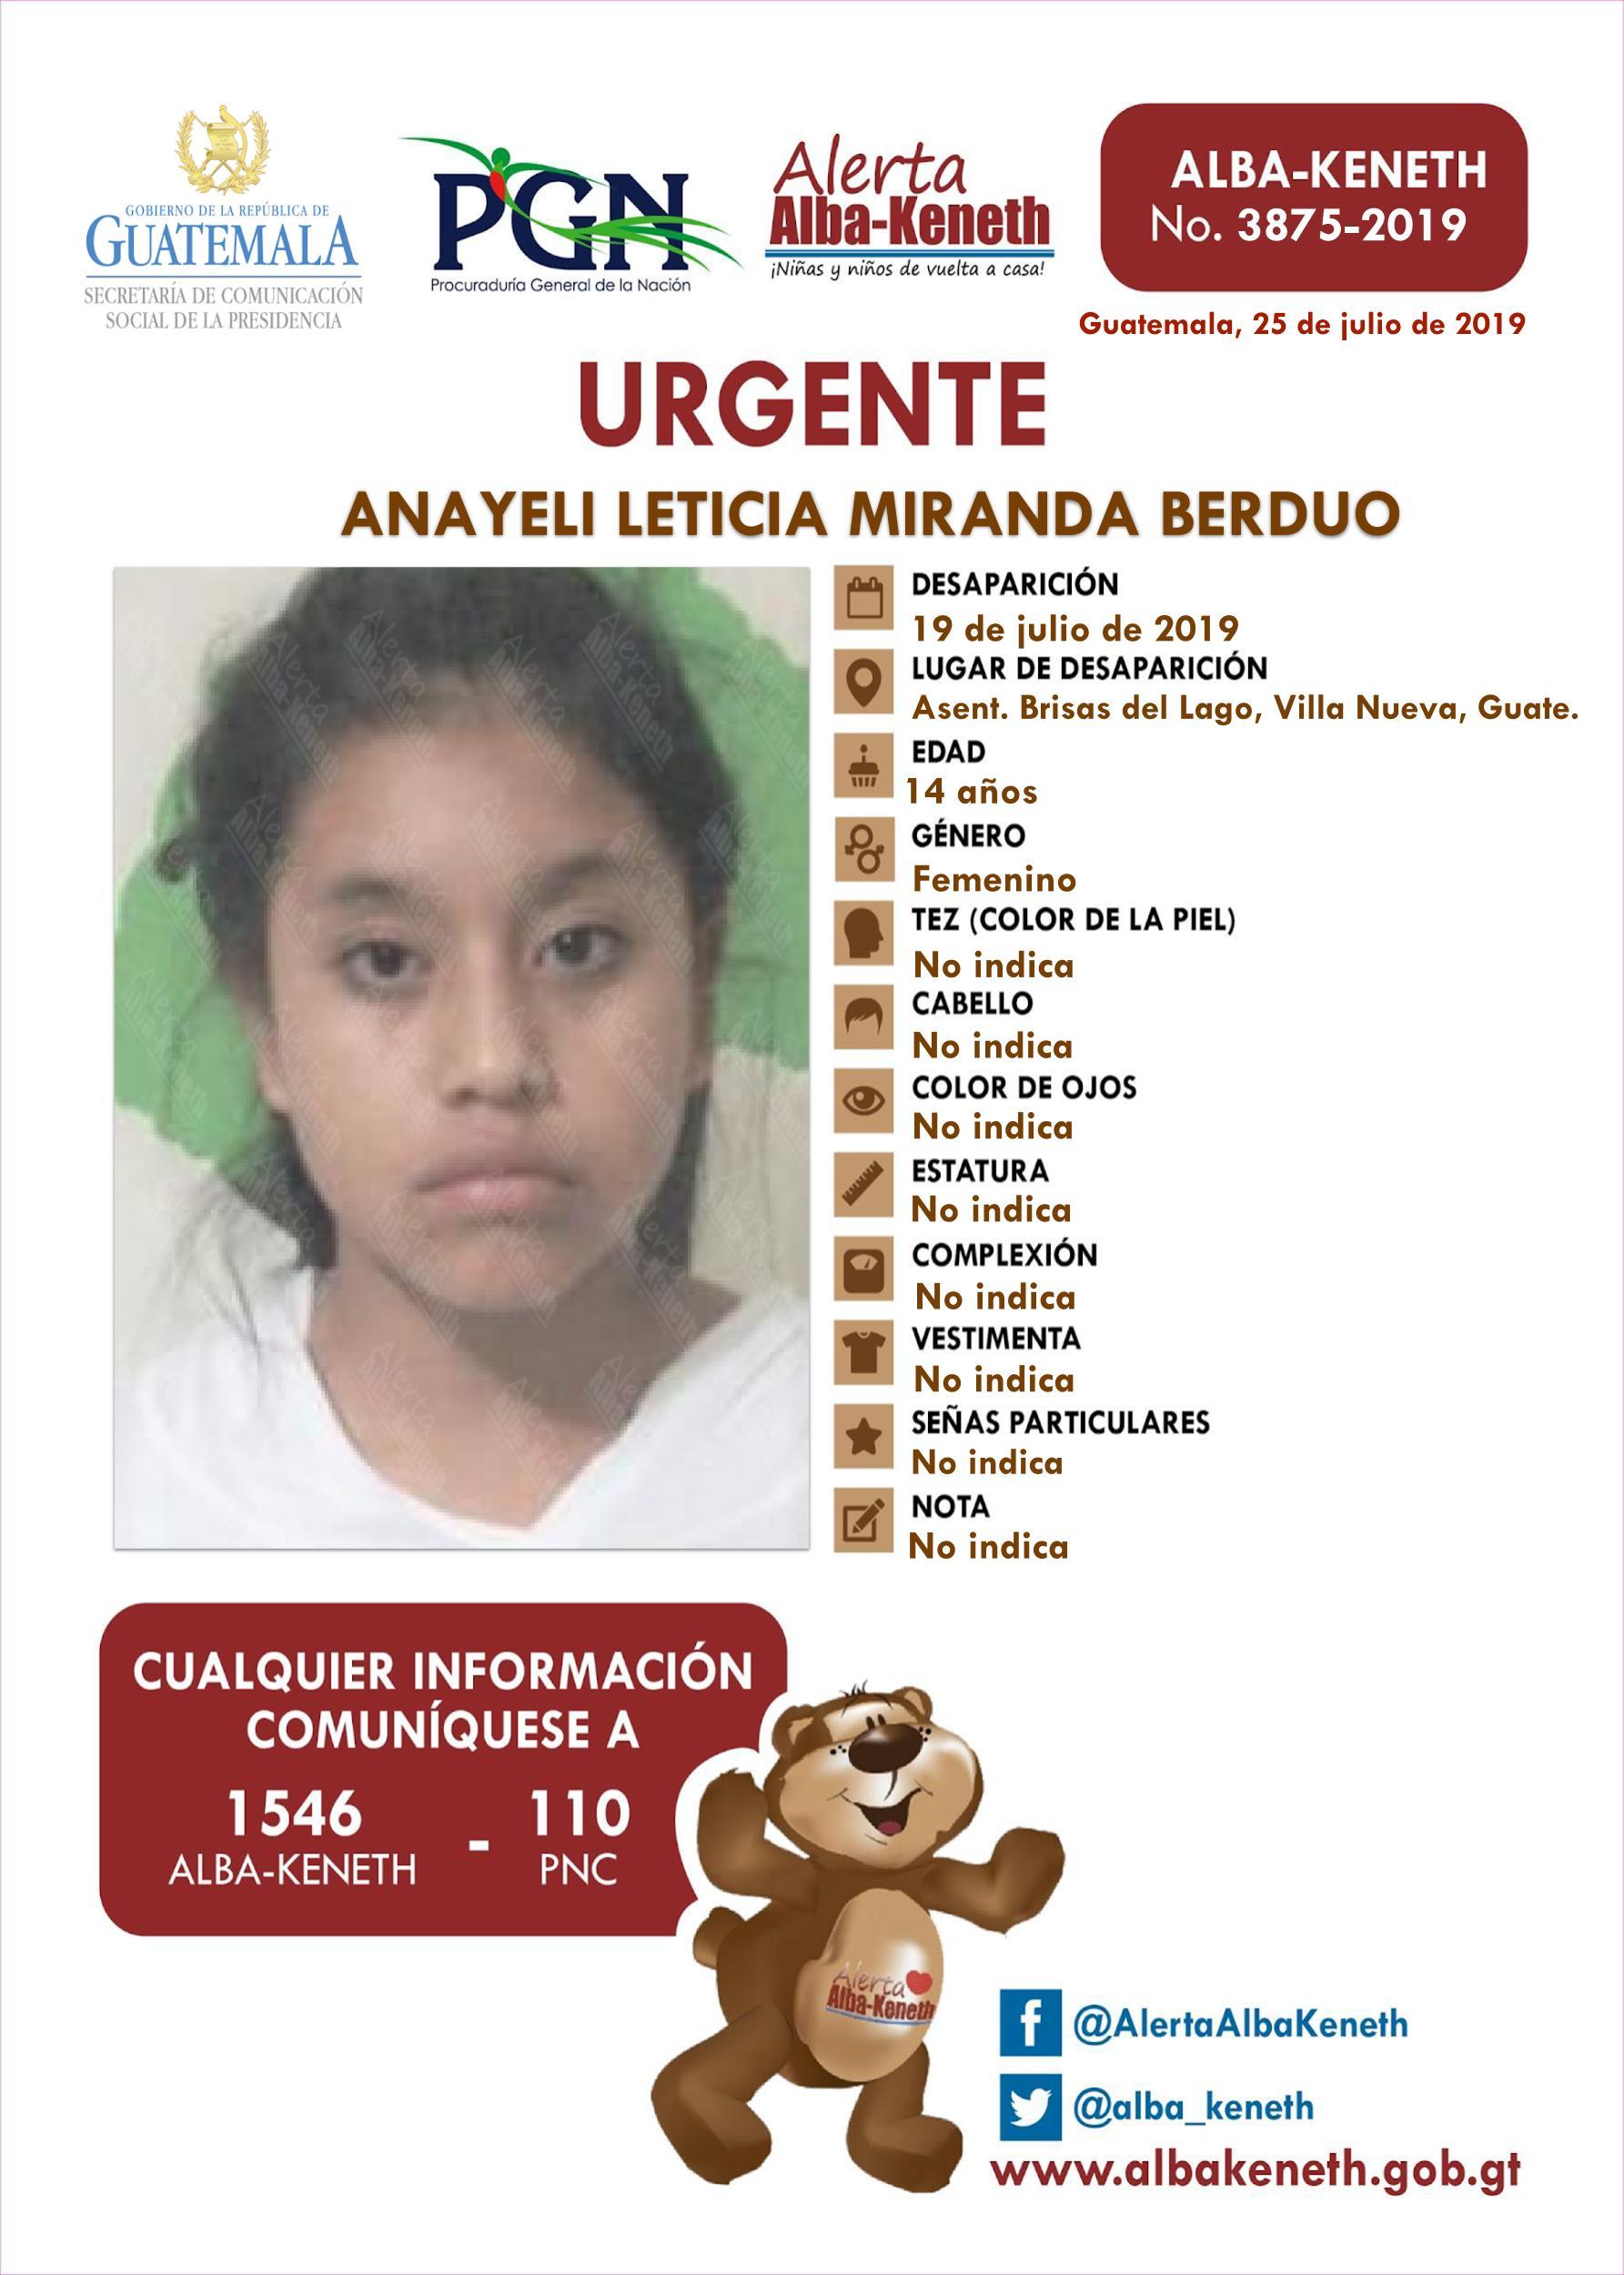 Anayeli Leticia Miranda Berduo